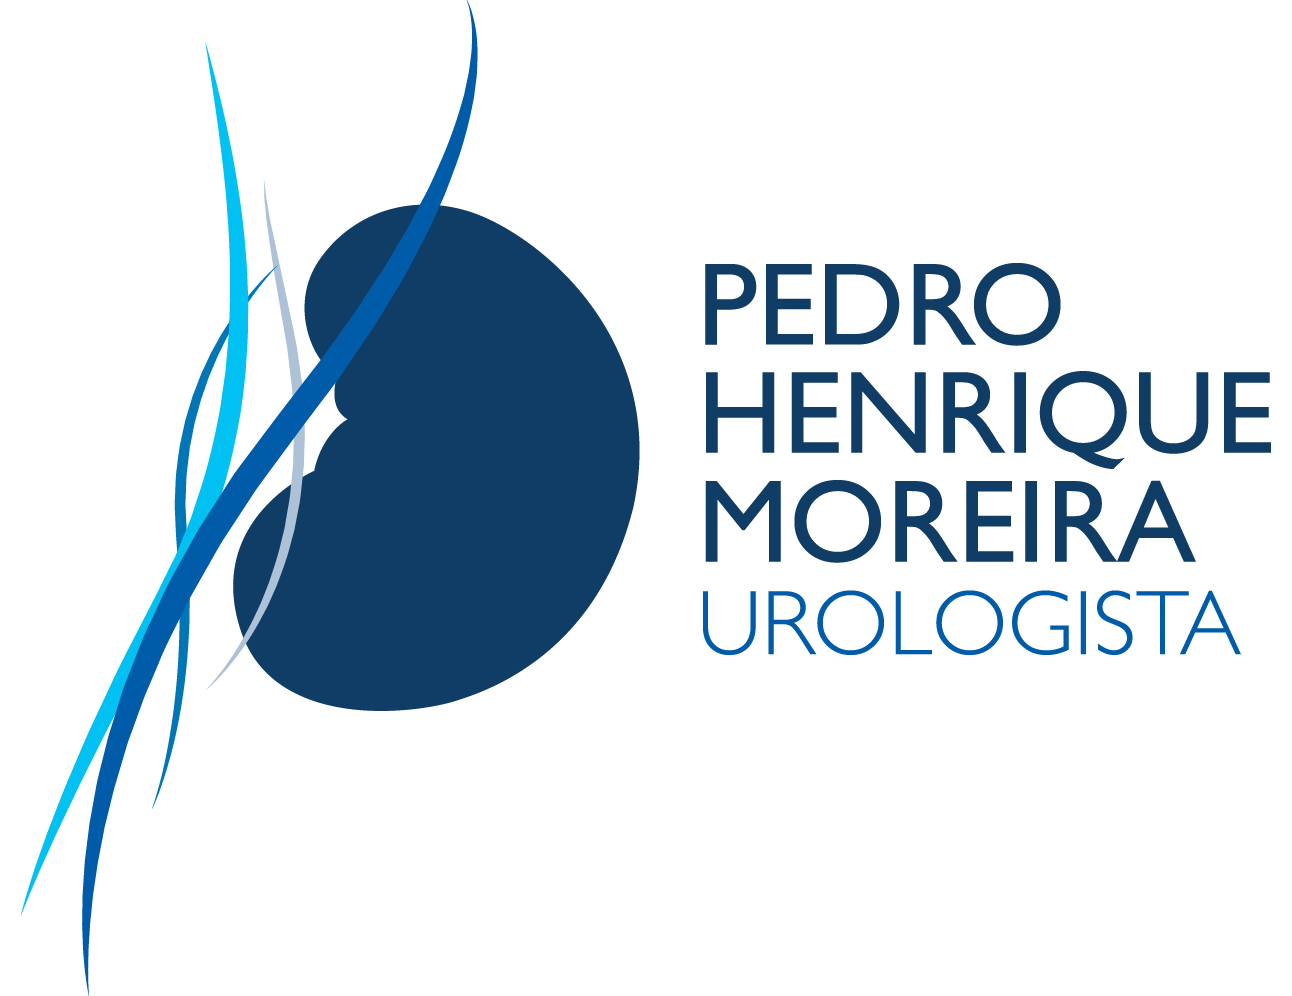 Dr. Pedro Henrique Moreira